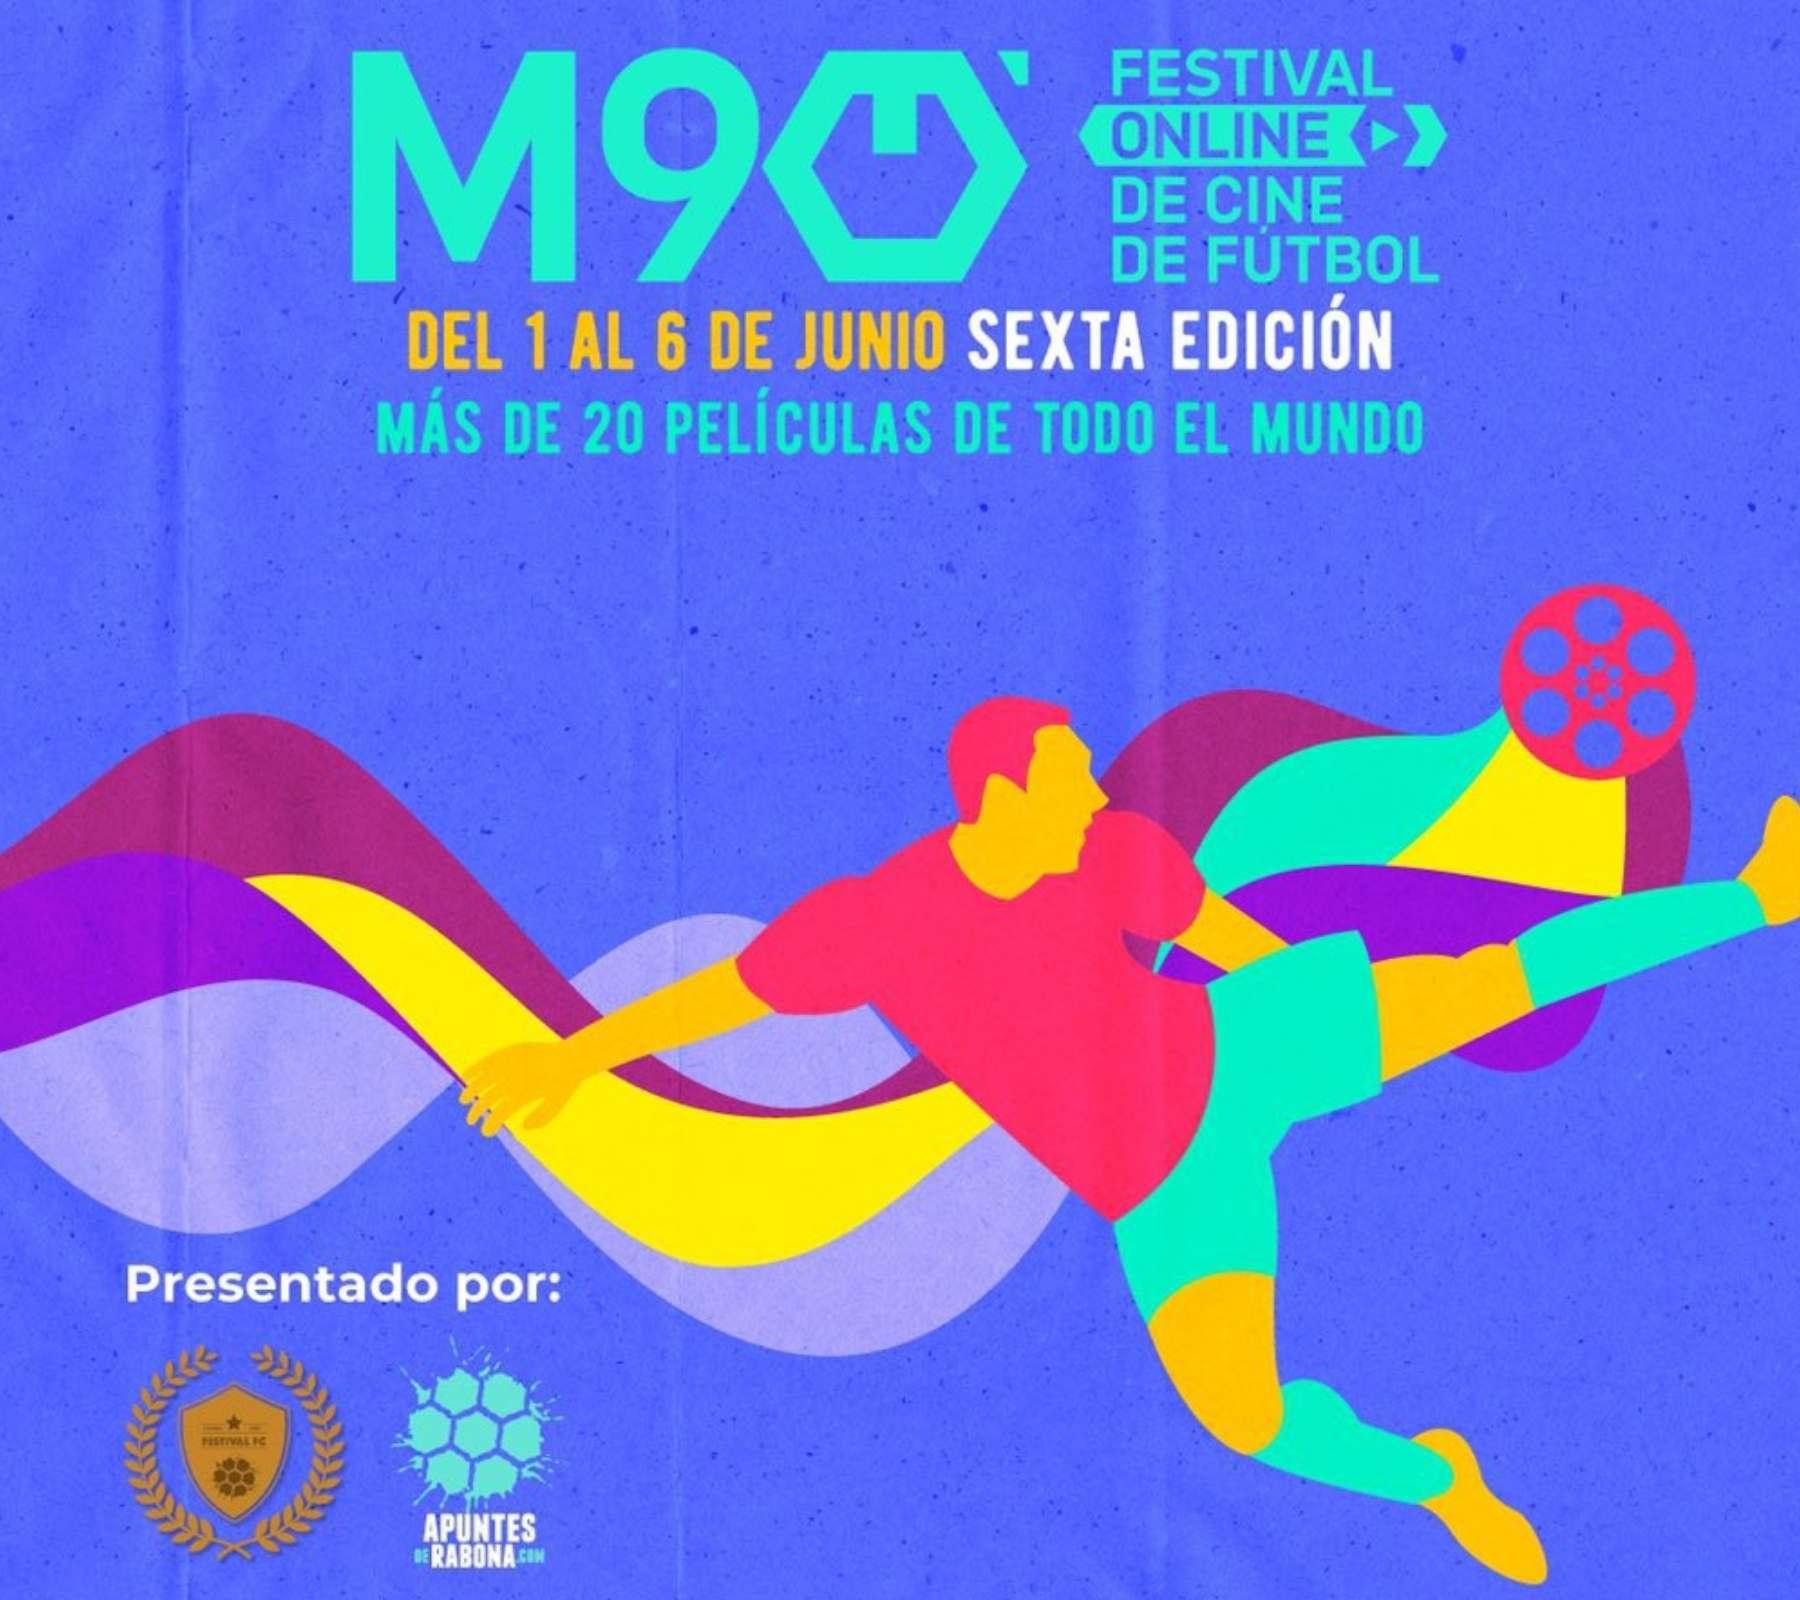 festival de cine futbol